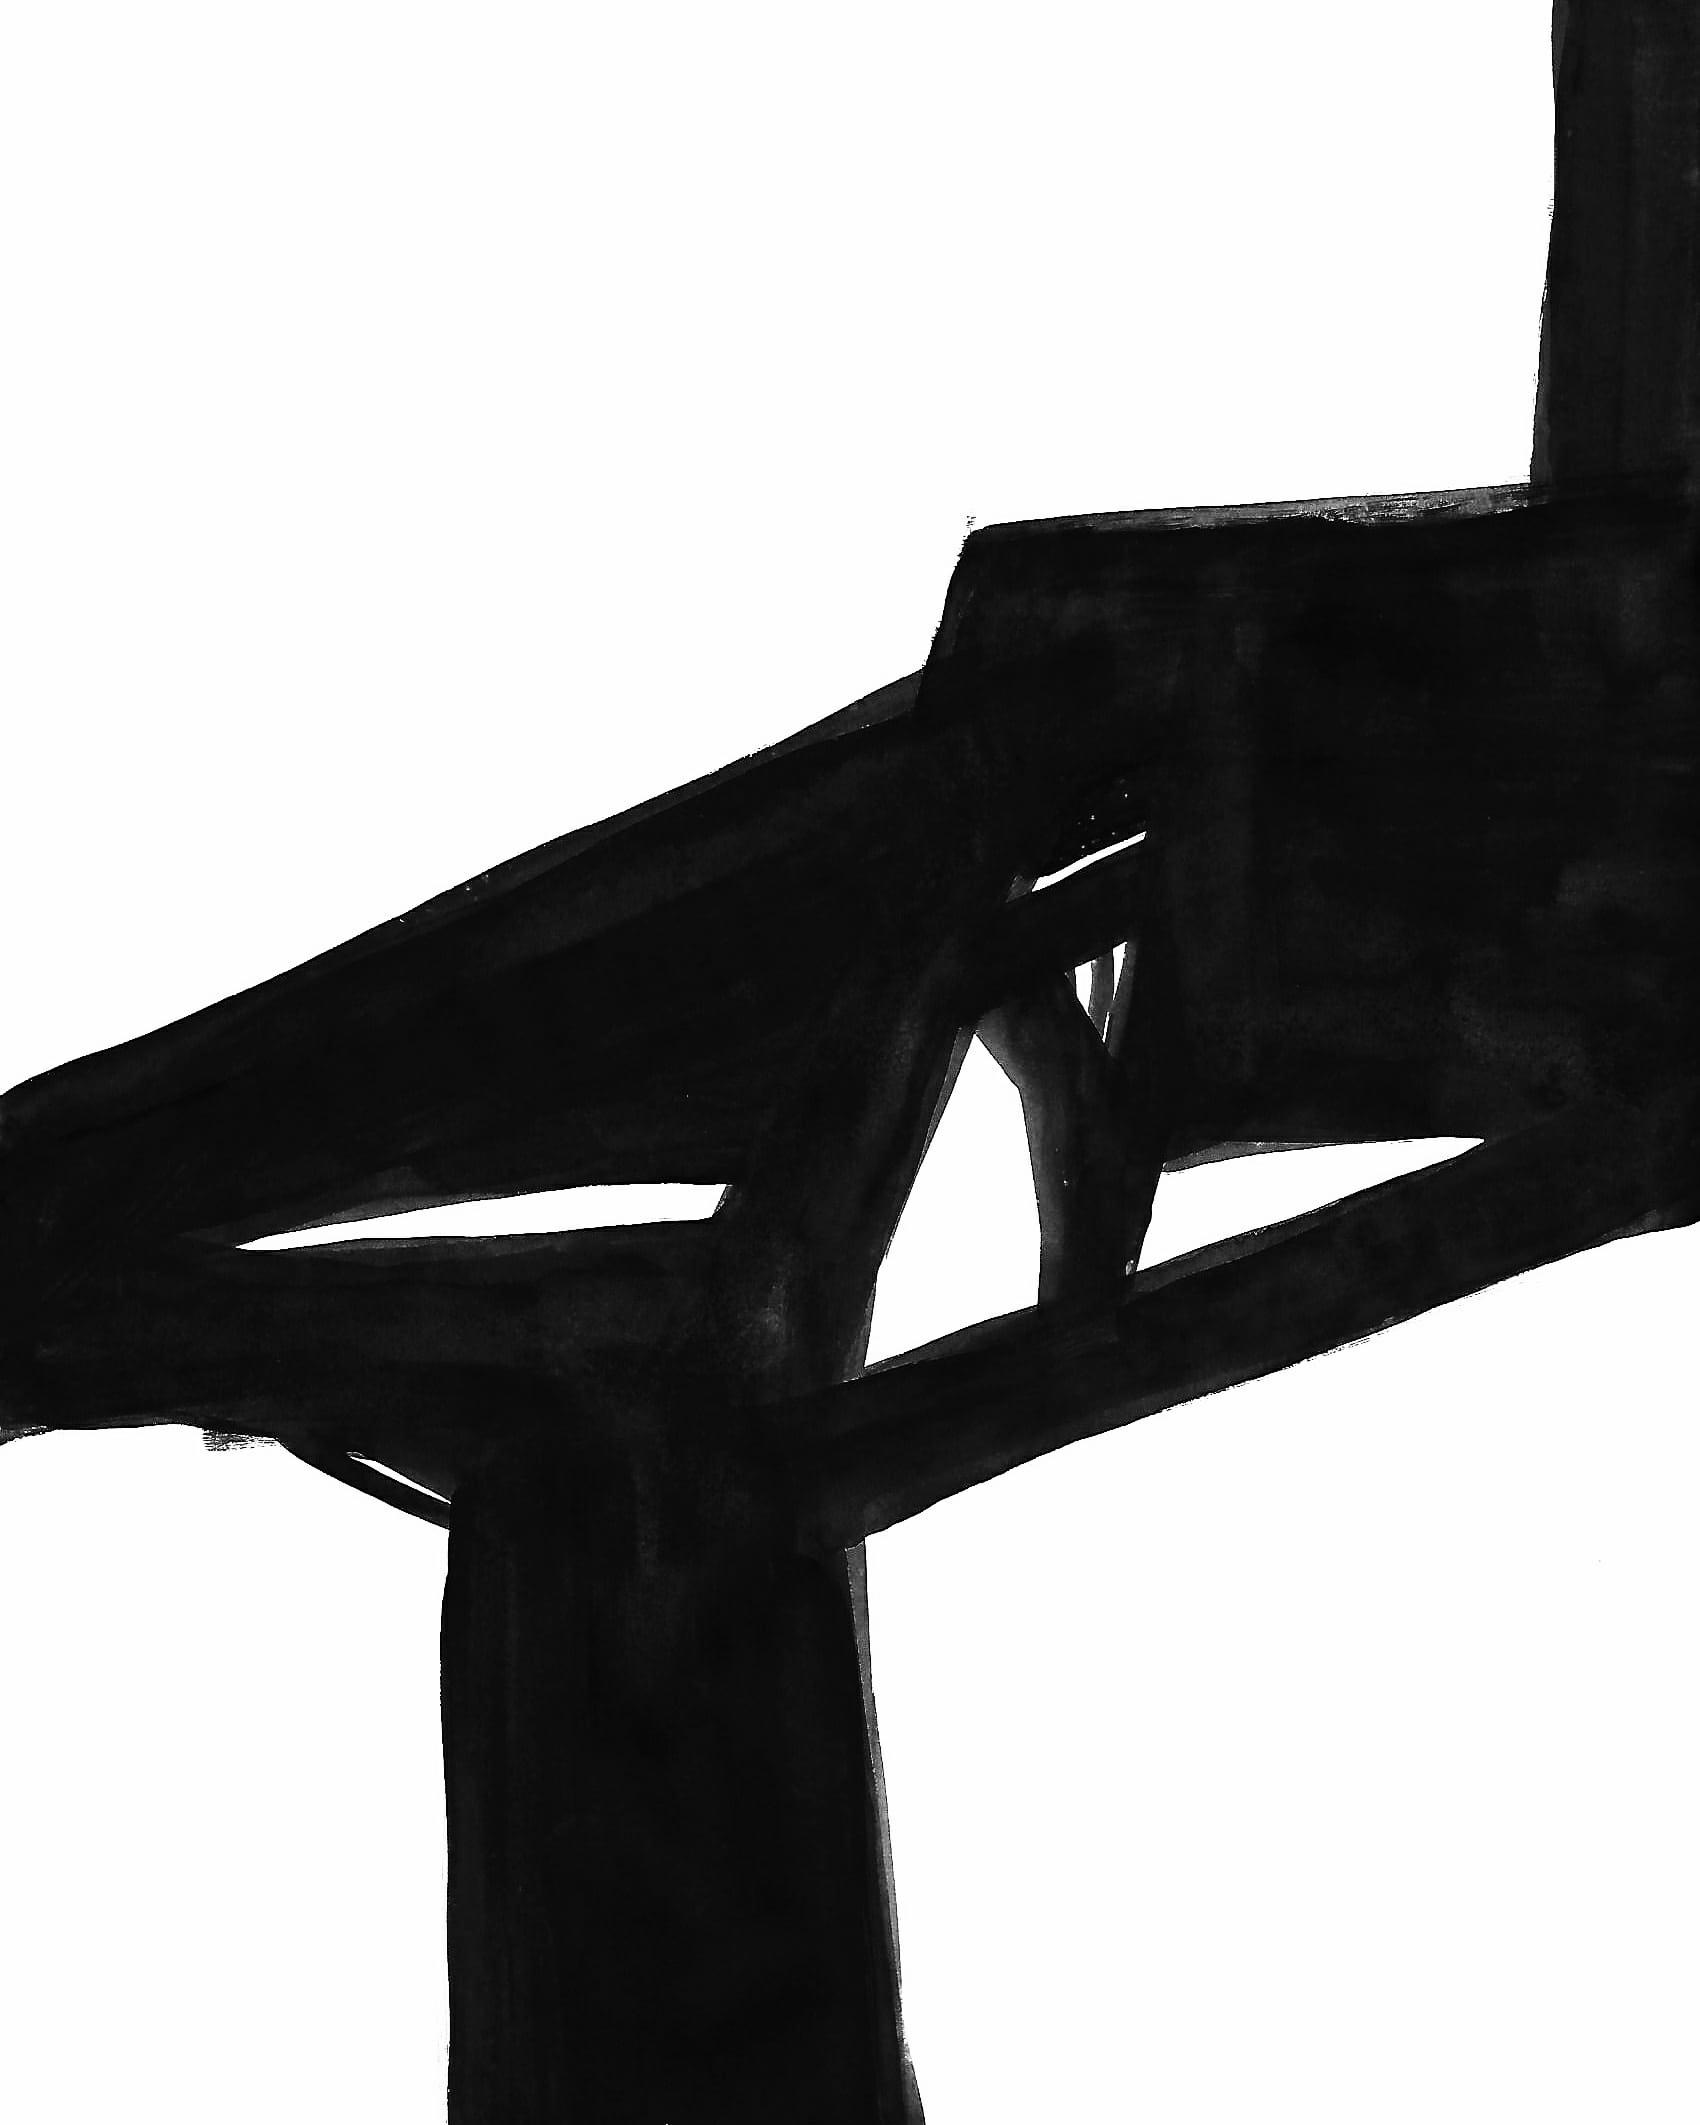 D'APRES FRANZ KLINE UNTITLED 03 2017